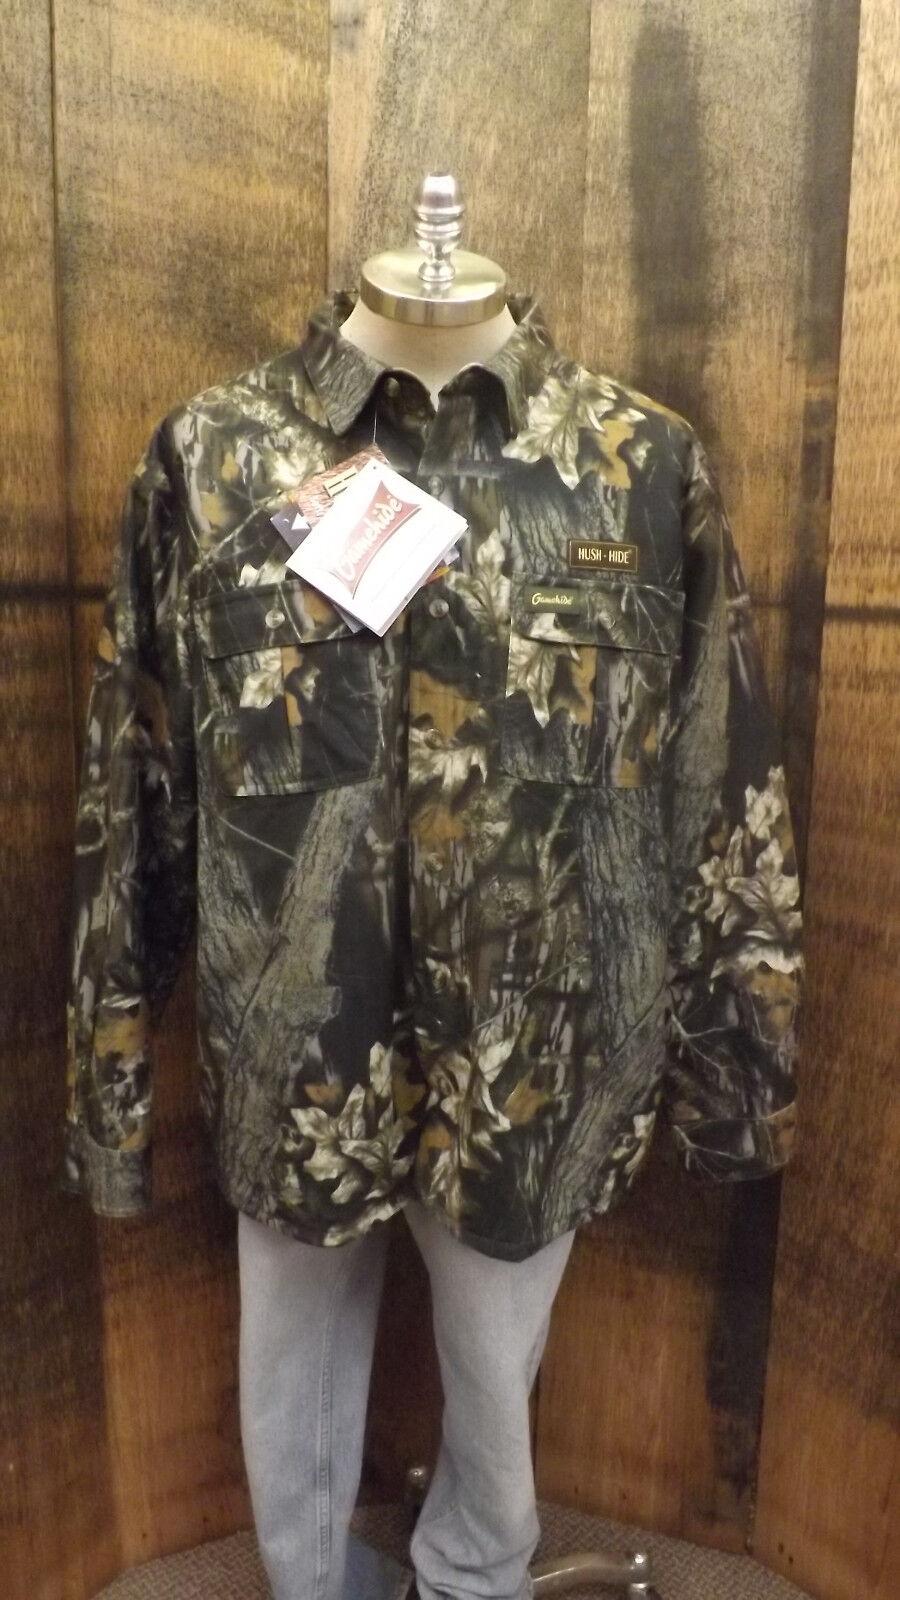 Vtg NOS  GameHide Quilted Jac-Shirt Mossy Oak Break-up Camo Waterproof Hush Hide  up to 50% off